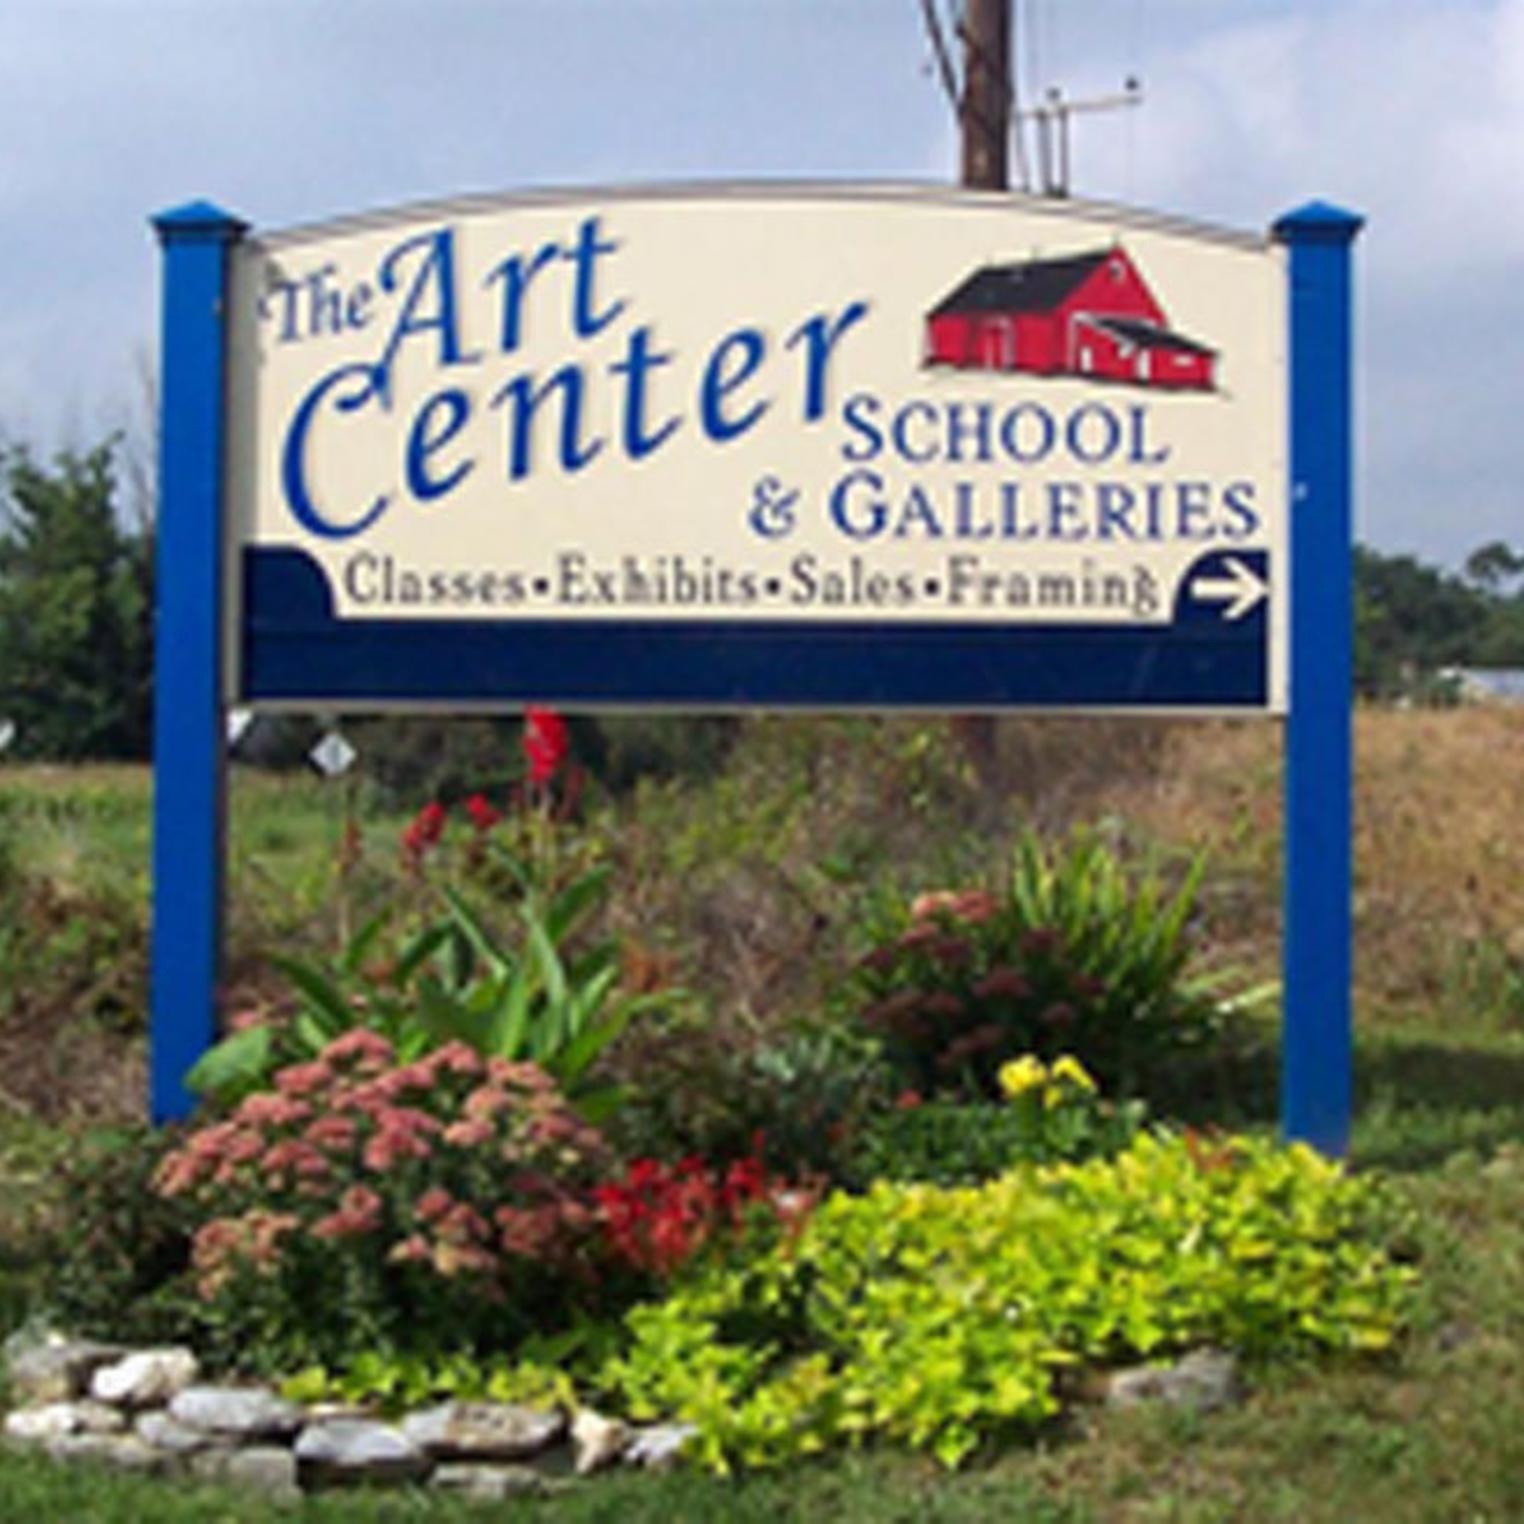 Art Center School & Galleries